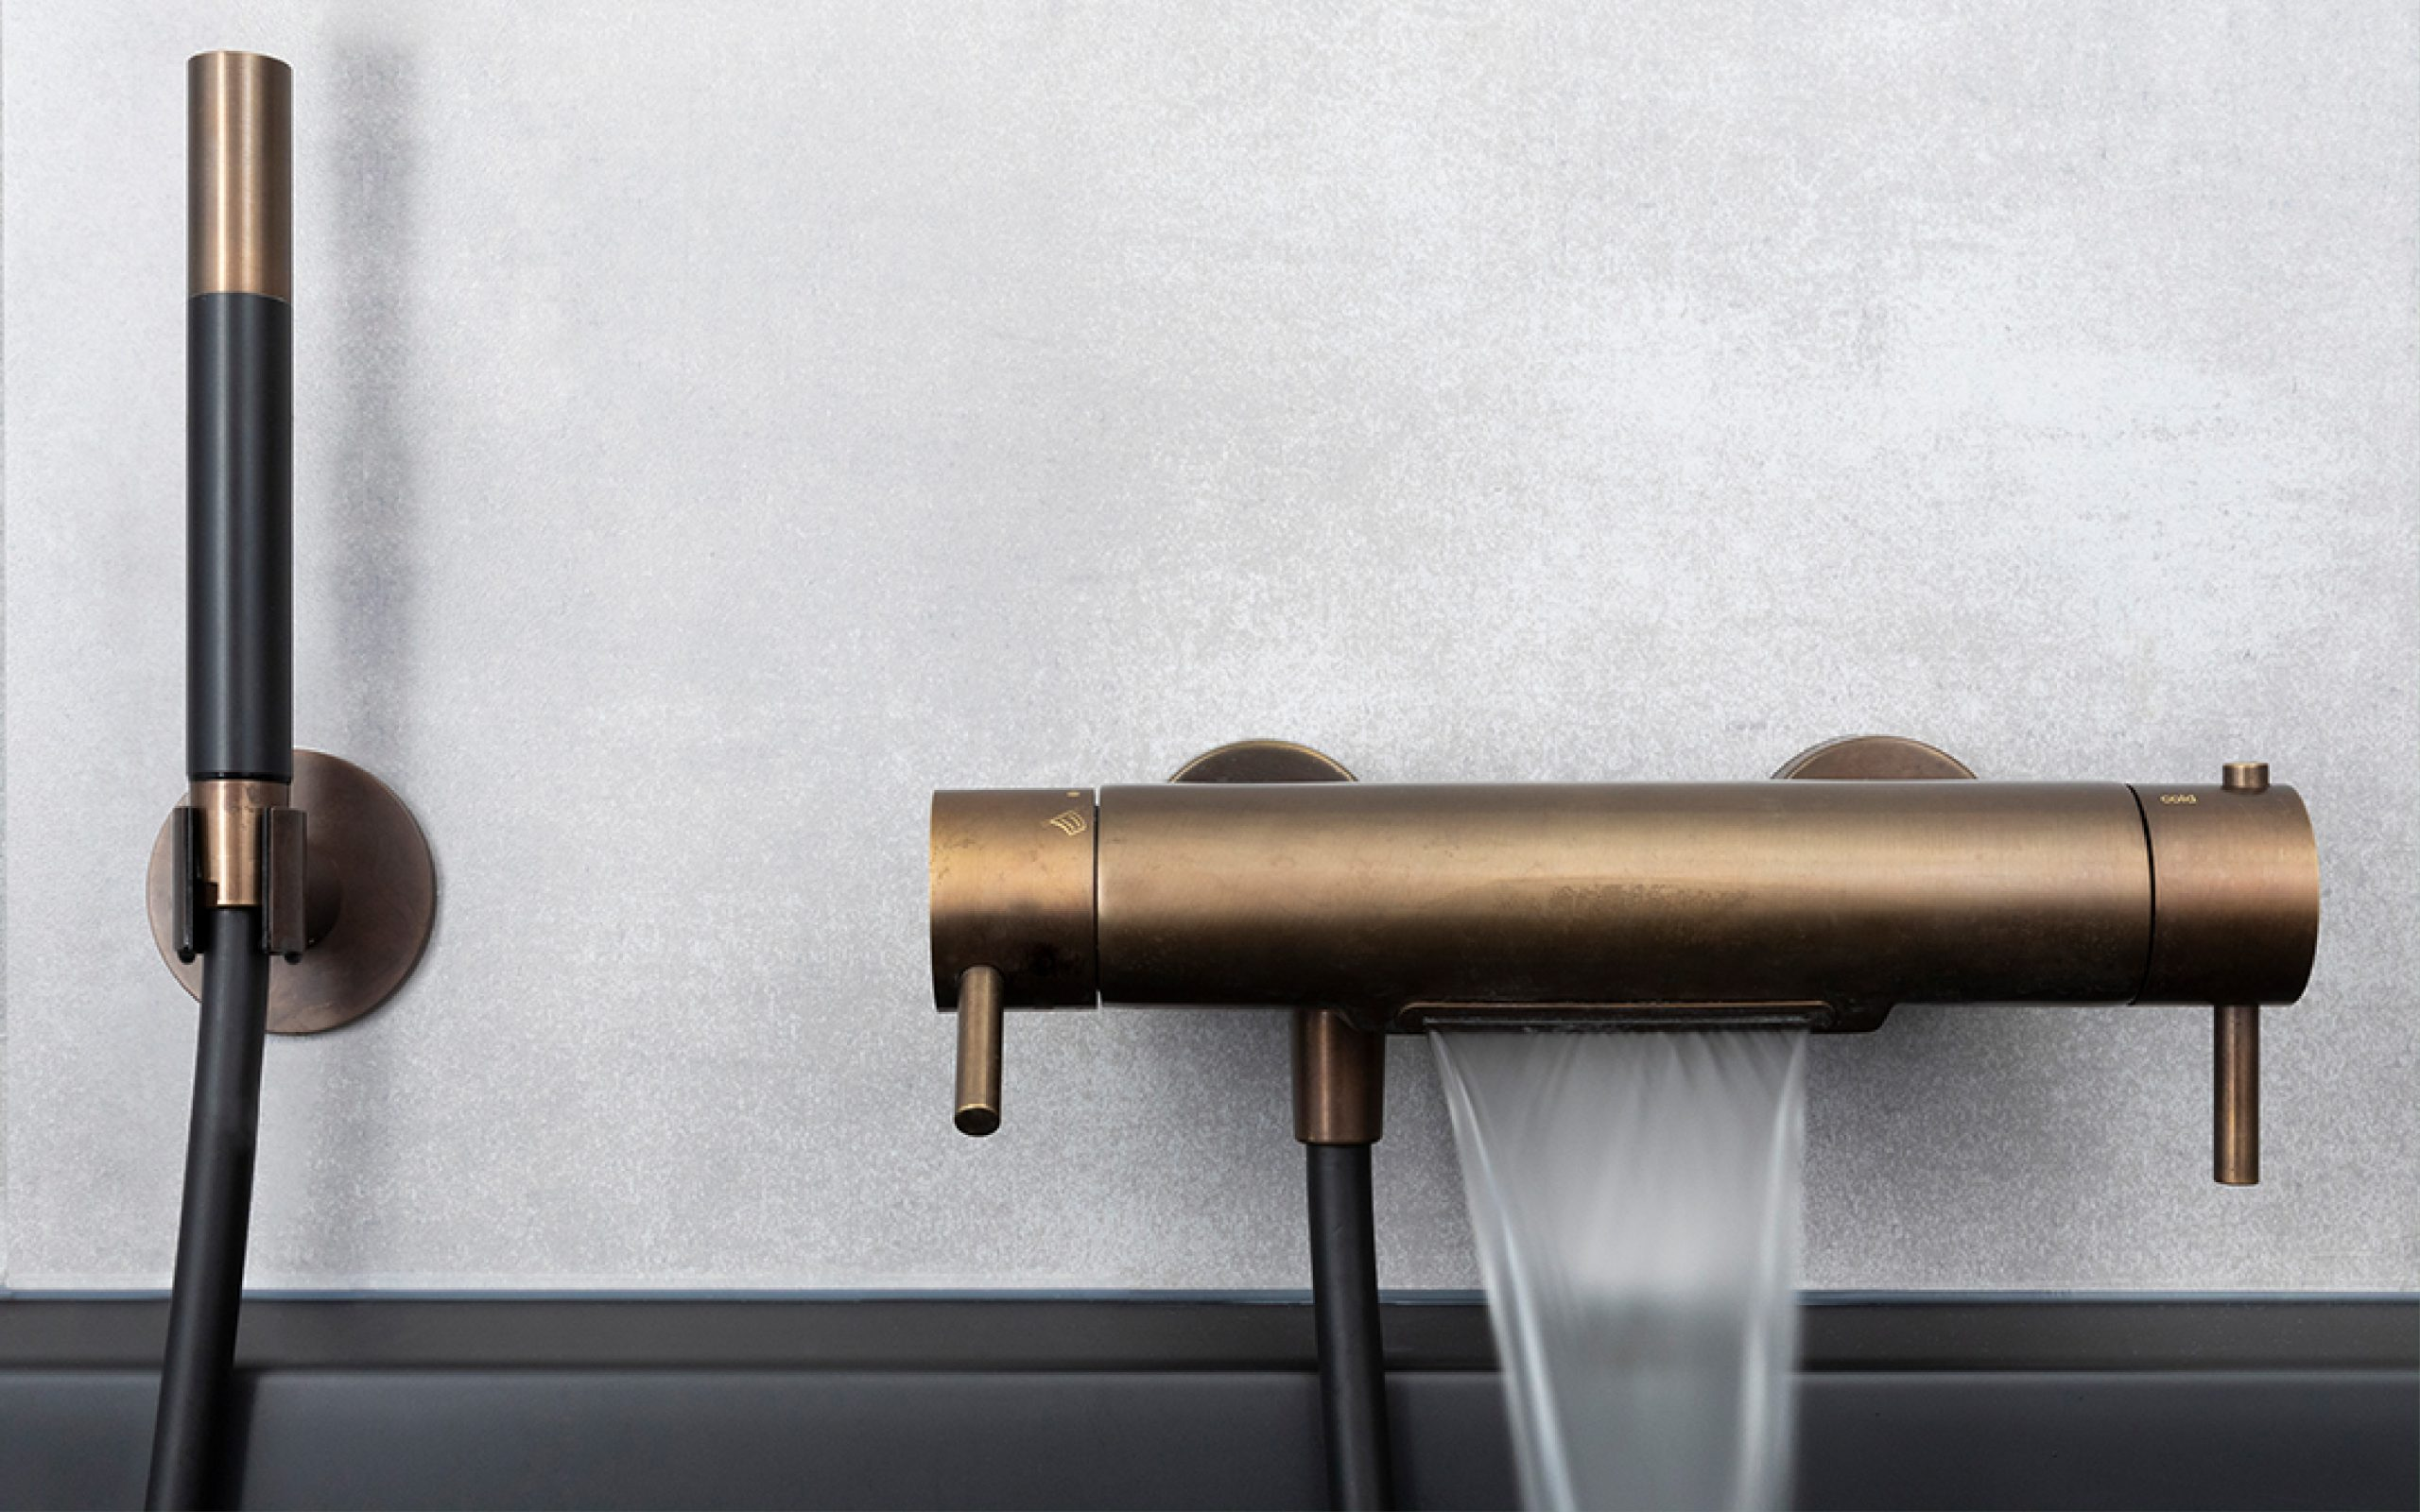 Hotbath | Badkraan, the art of living